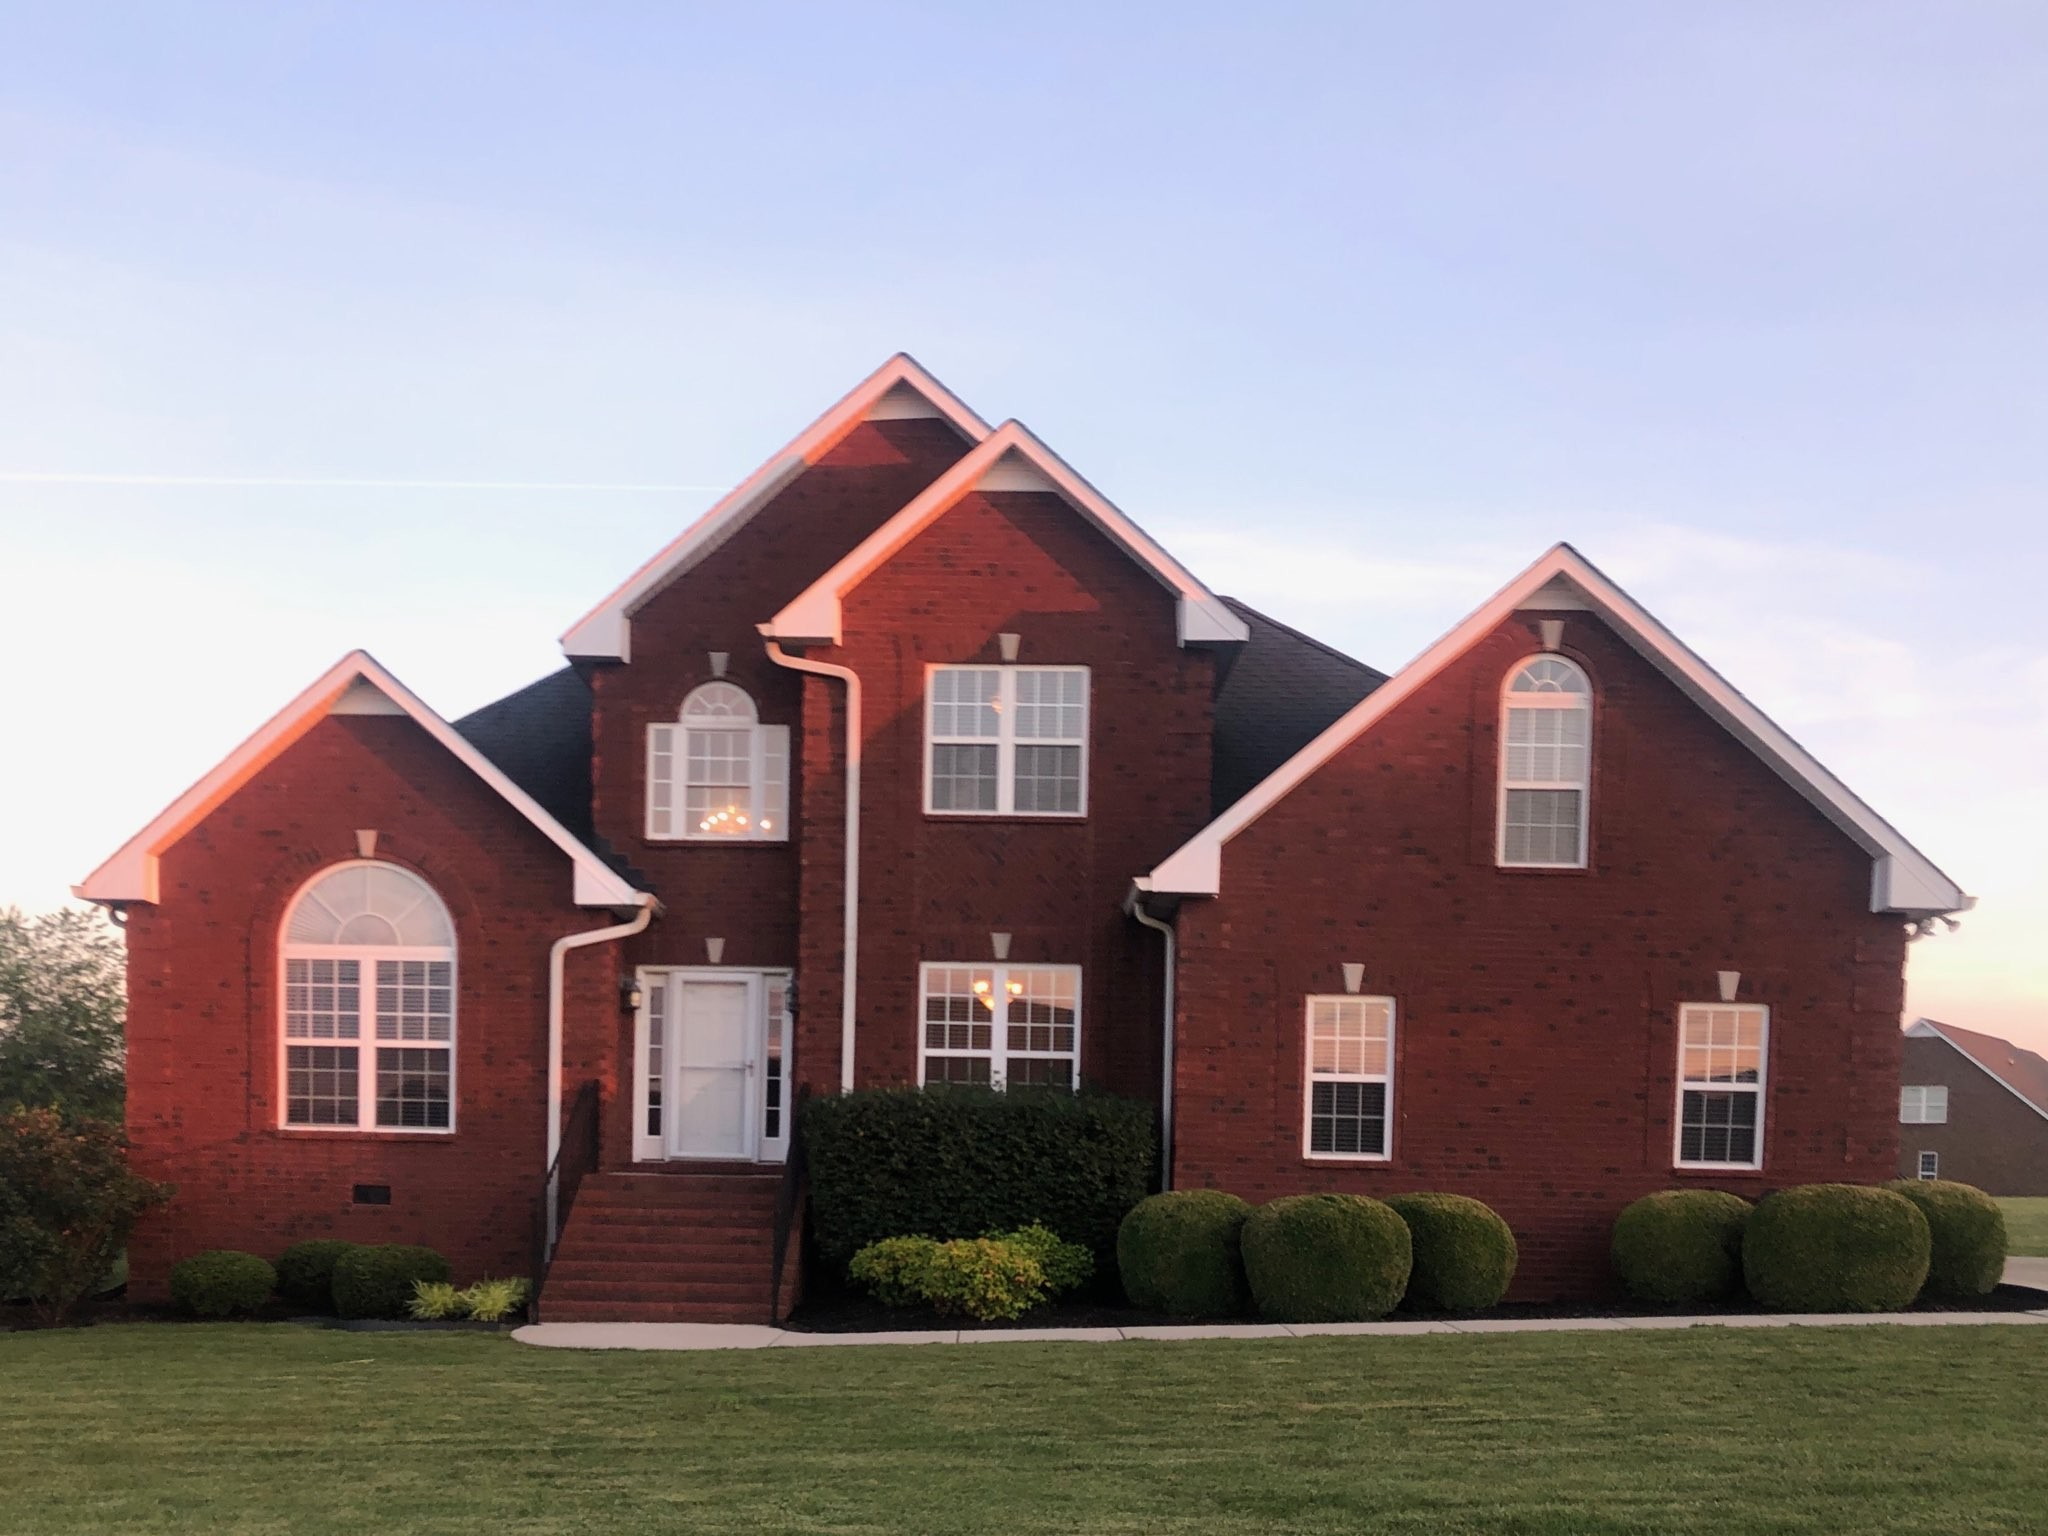 98 Aberdeen Ave, Hillsboro, TN 37342 - Hillsboro, TN real estate listing